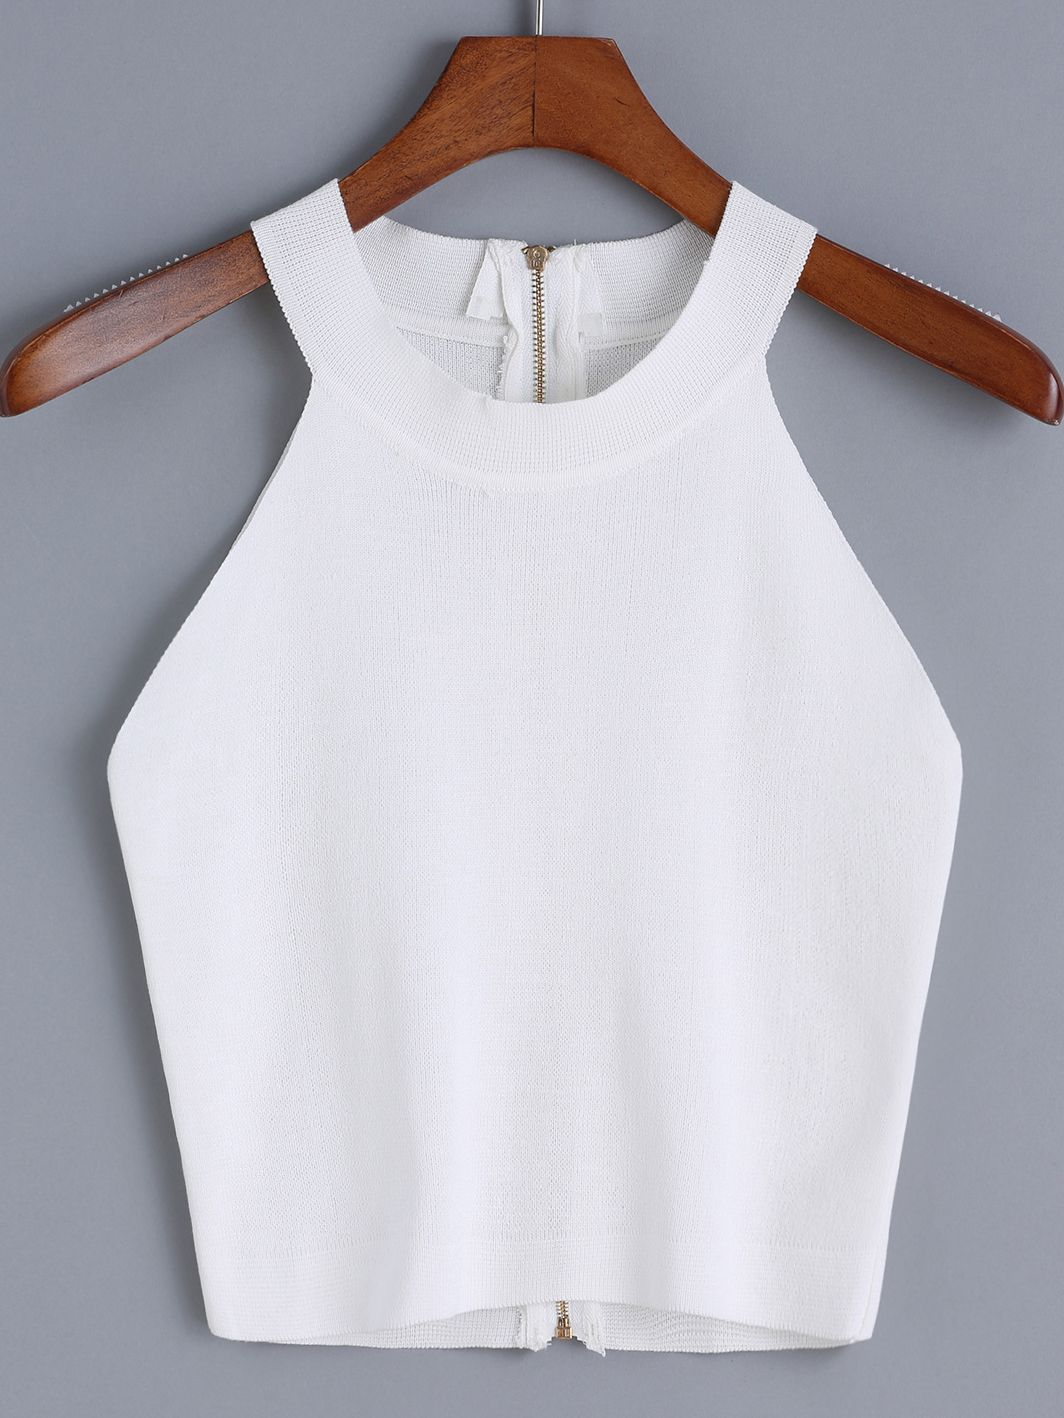 romwe halter zipper knit cami top crop tops pinterest. Black Bedroom Furniture Sets. Home Design Ideas